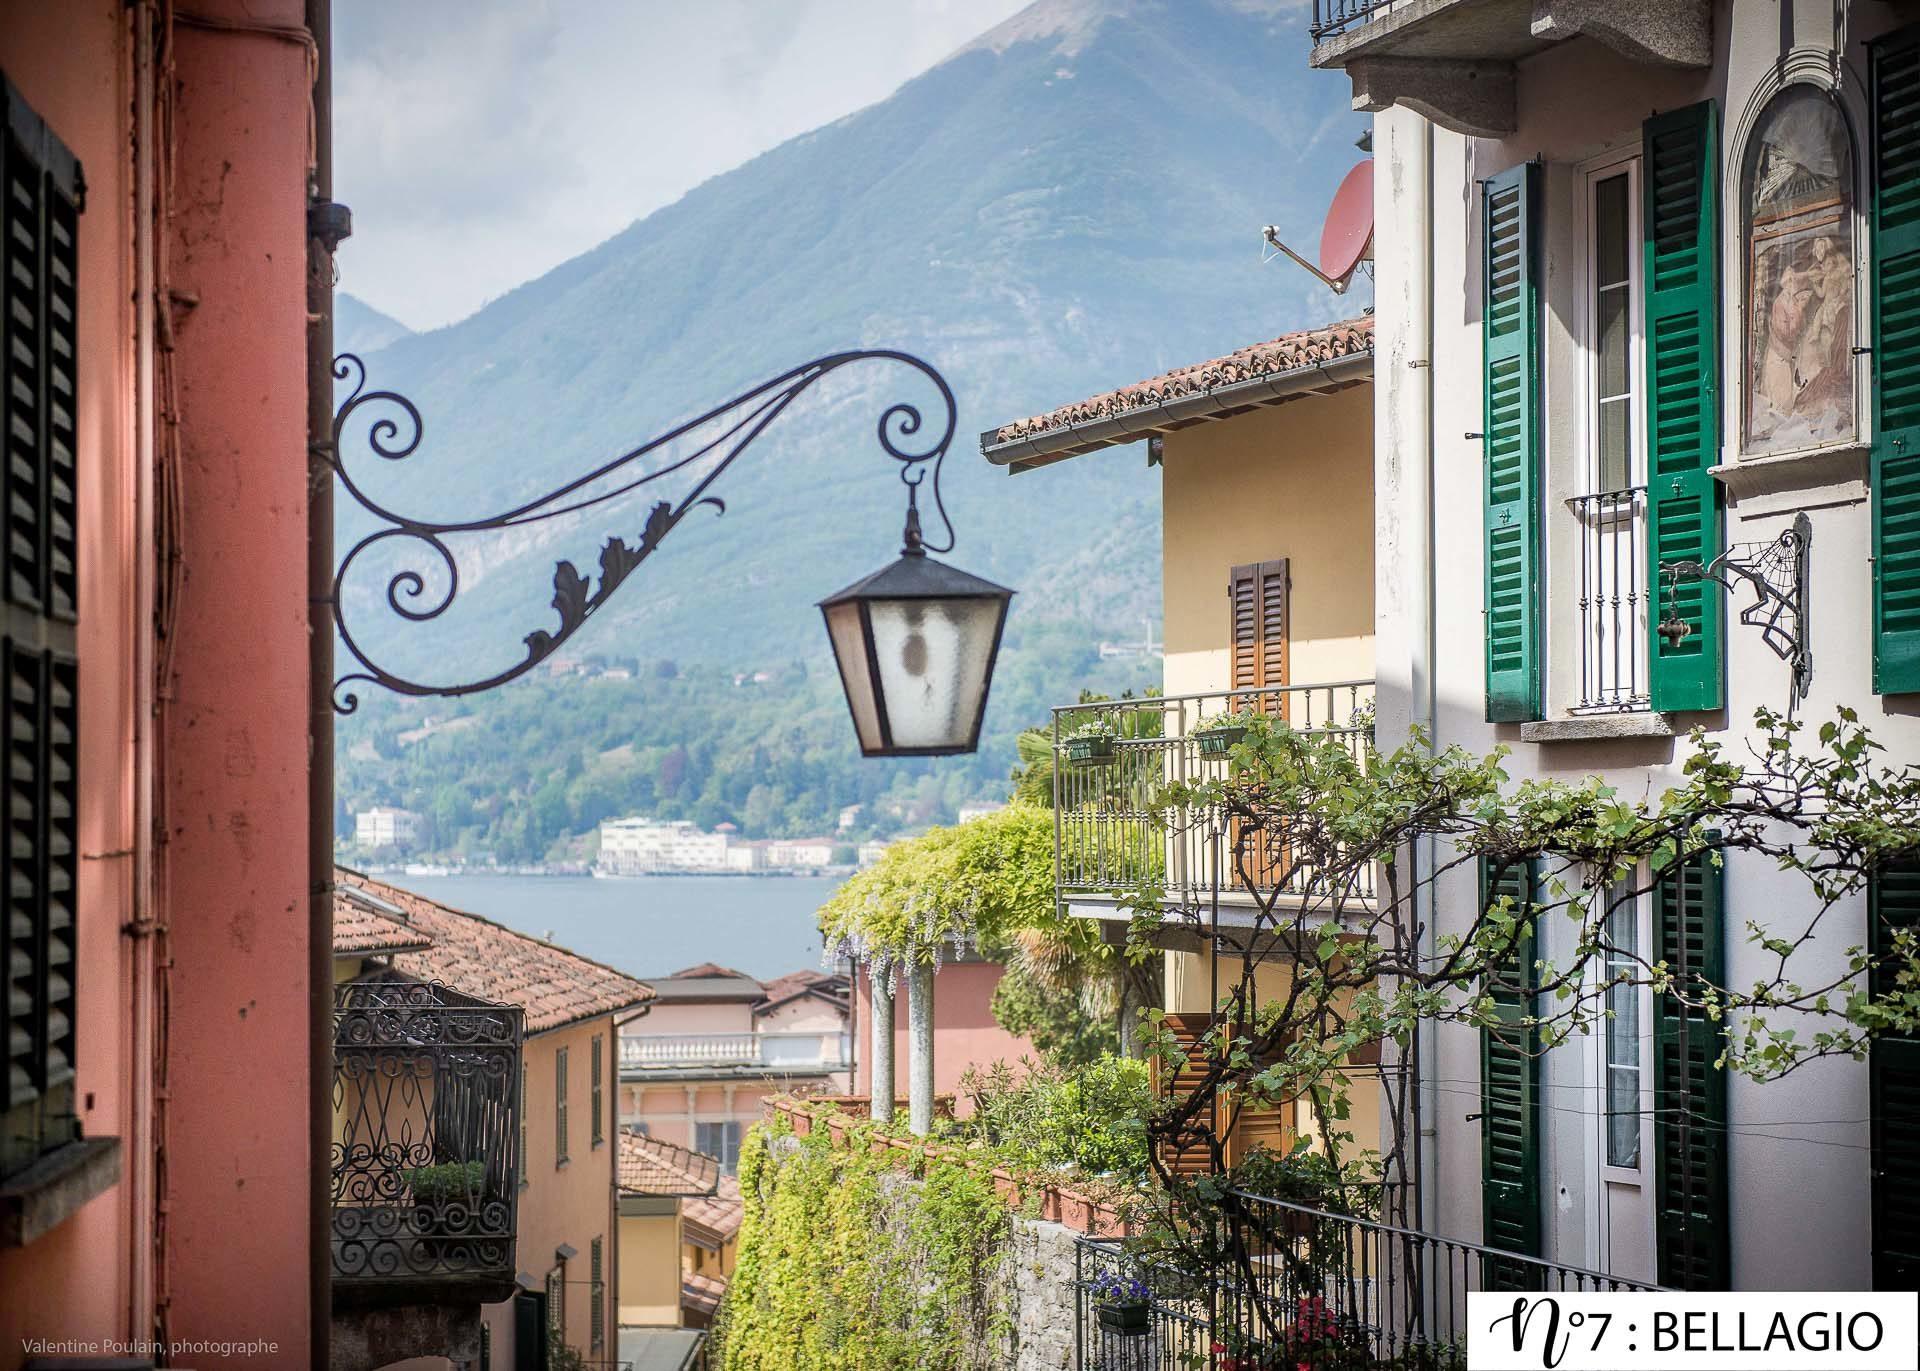 TIRAGE Bellagio - Valentine Poulain